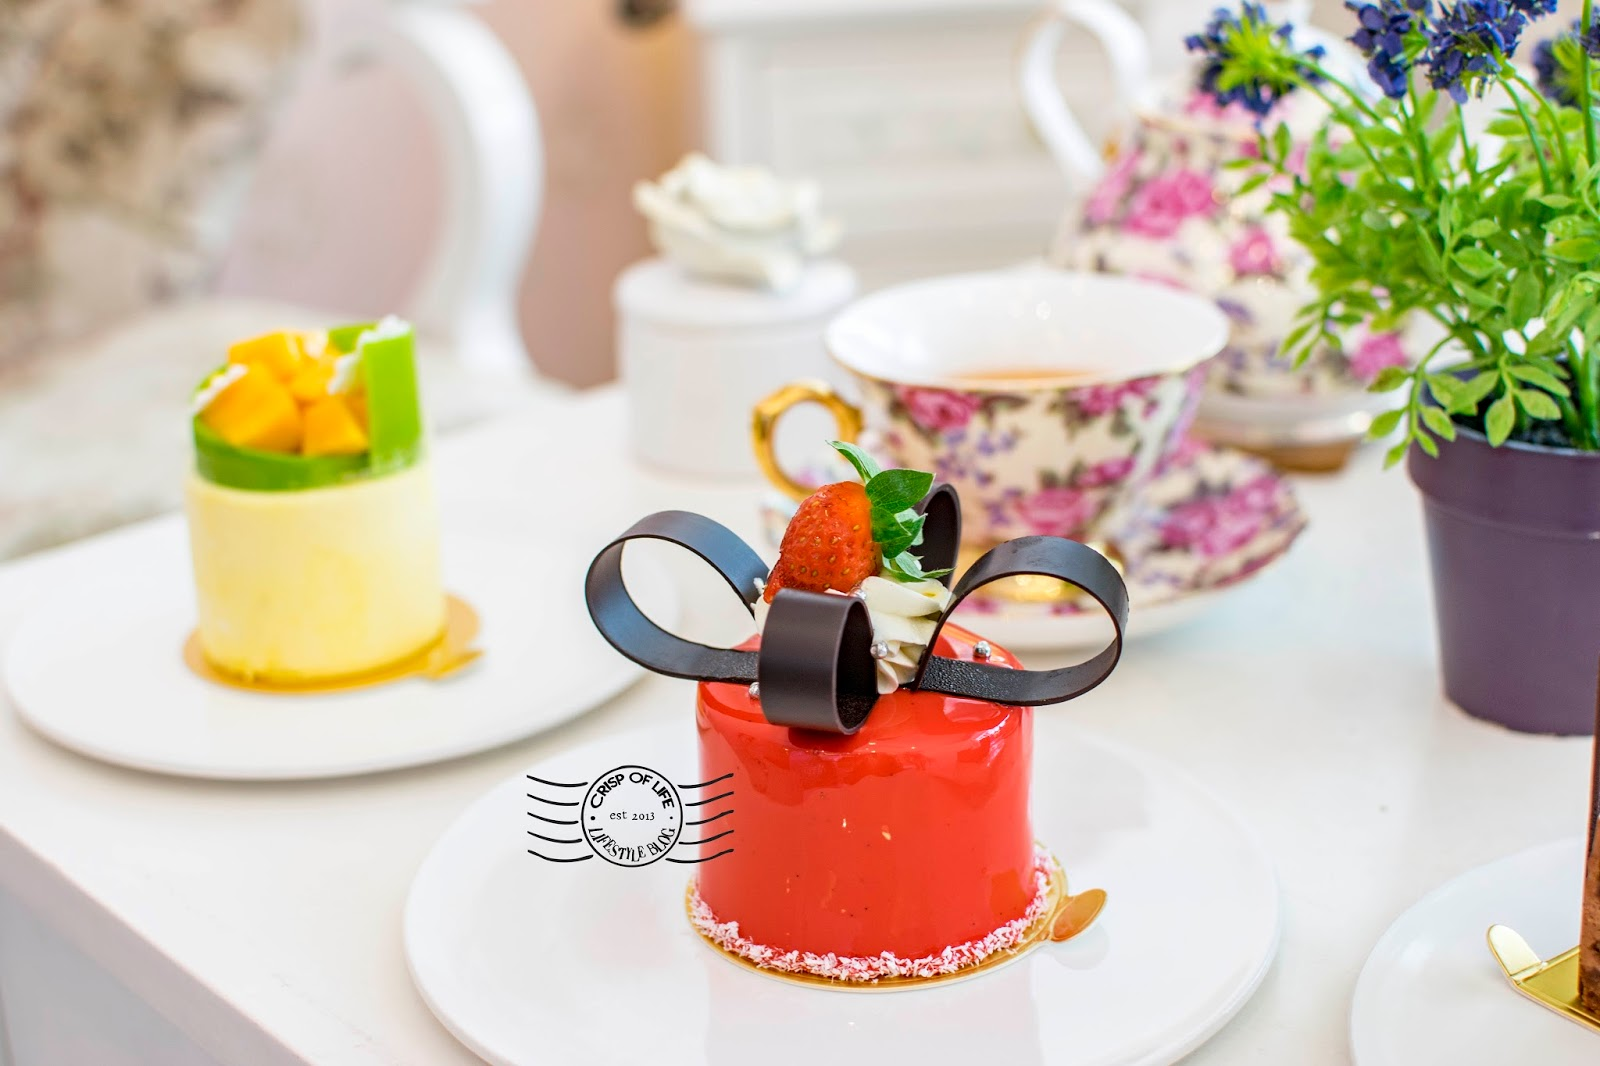 Dessert Cake Pastry House Jalan Gottlieb Vanilla Rosa Penang